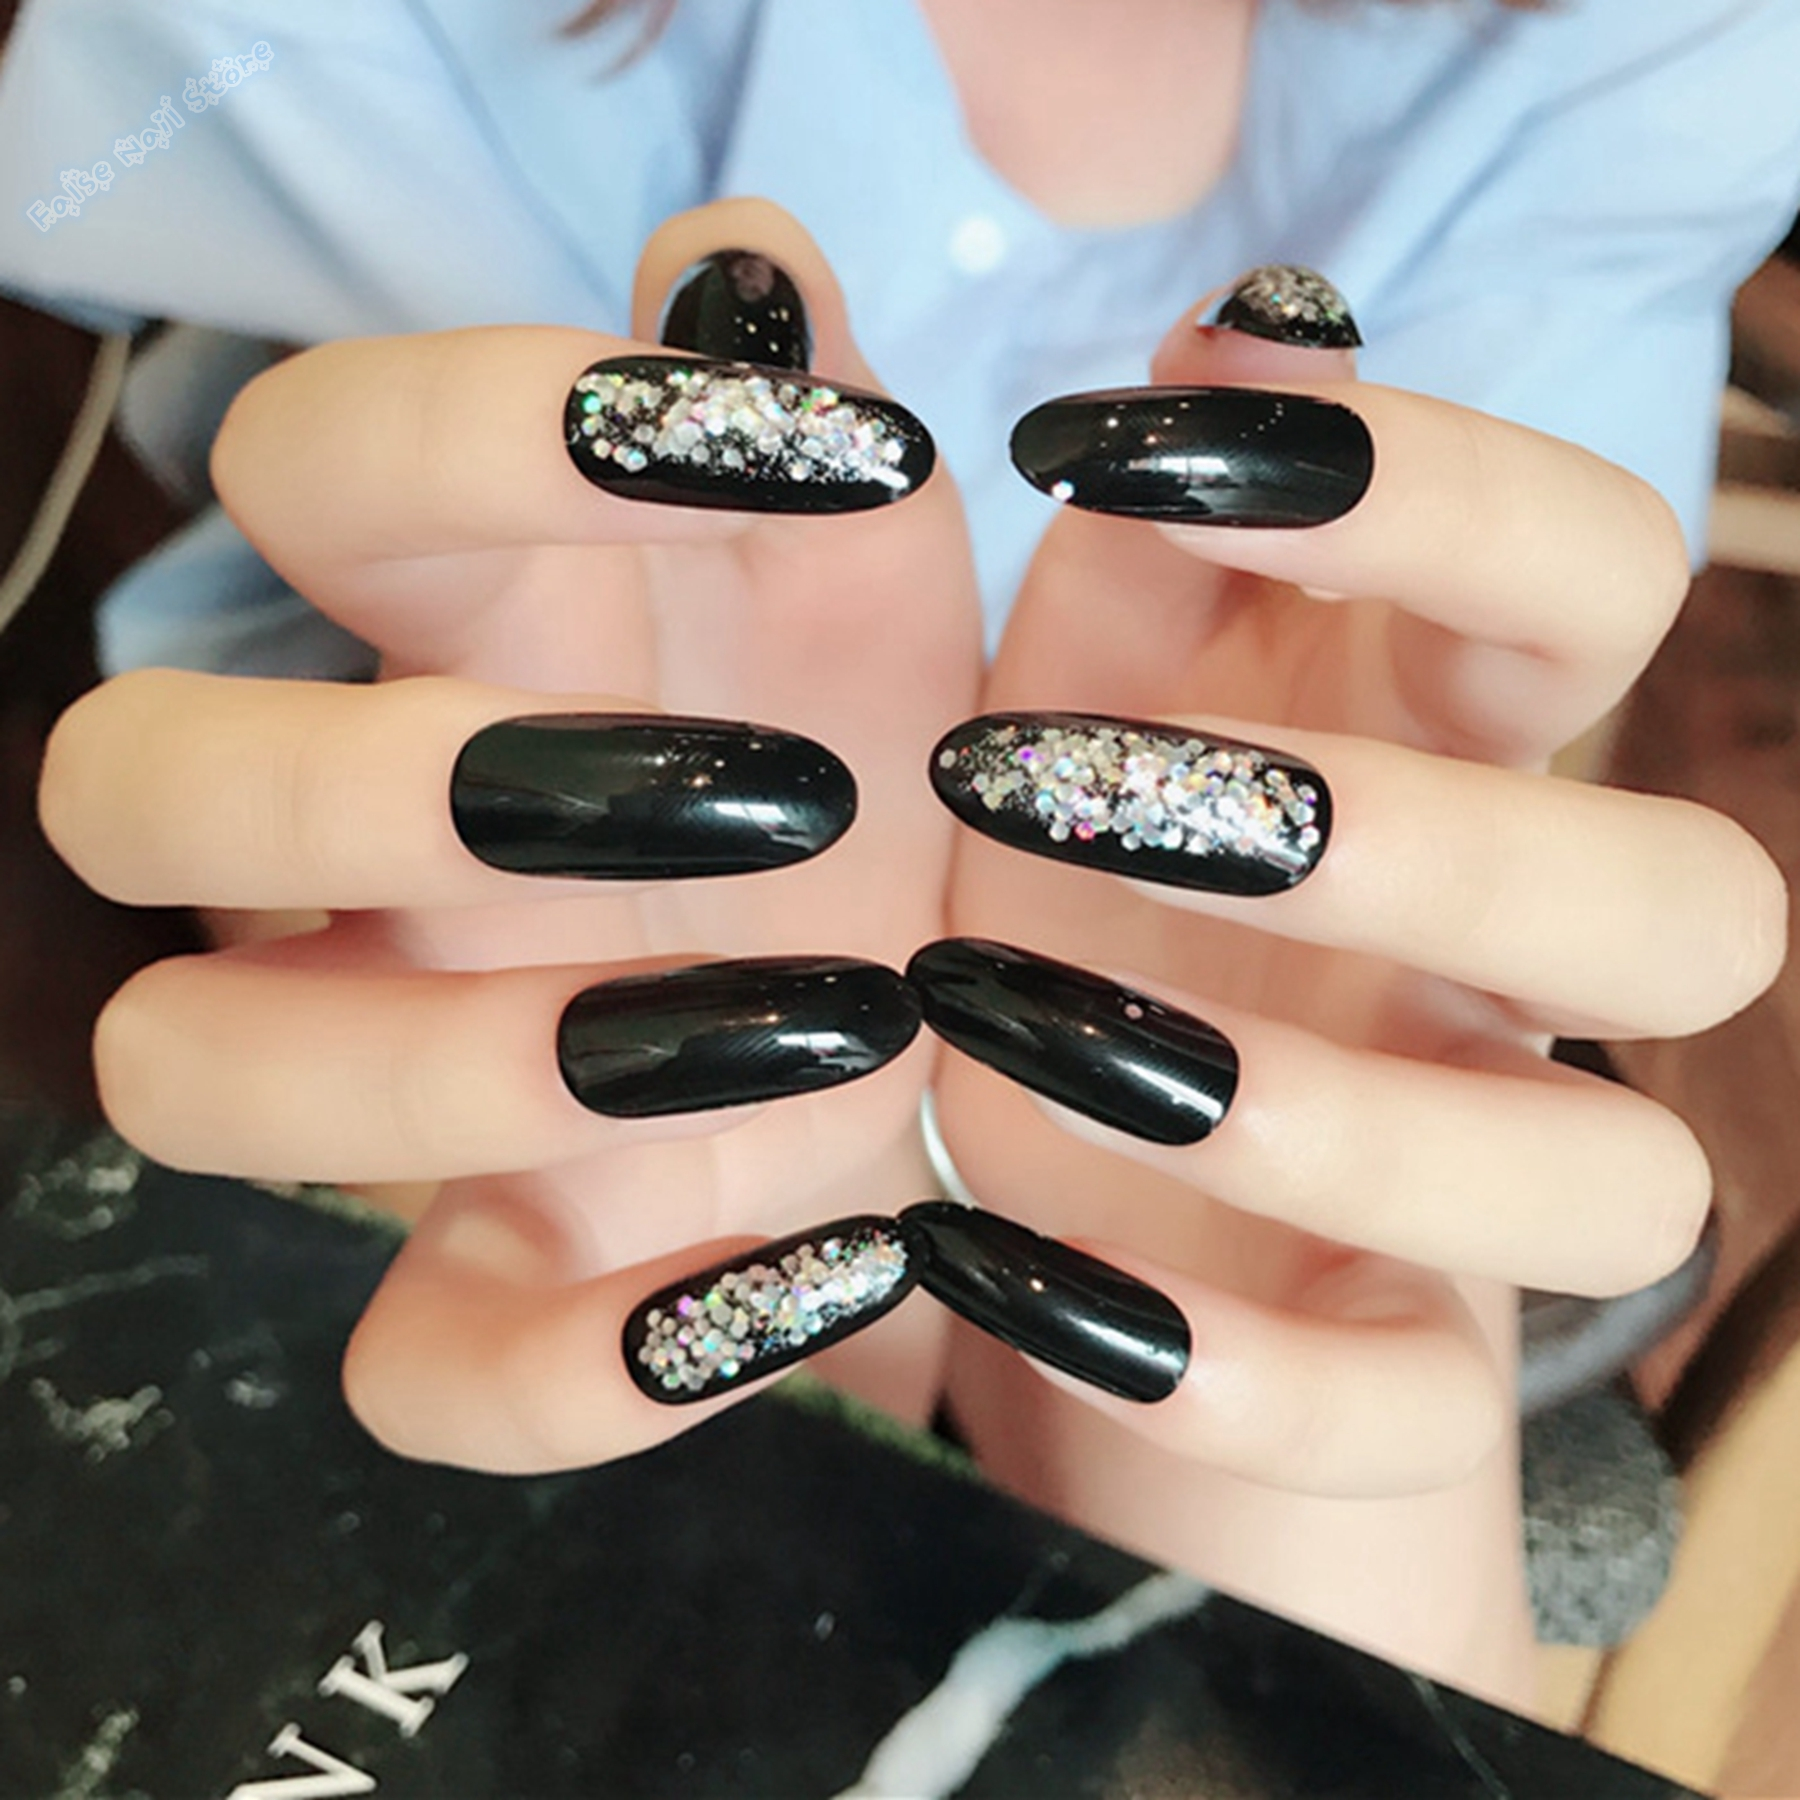 Fine Glitter Tips Acrylic Nails Ornament - Nail Art Ideas - morihati.com